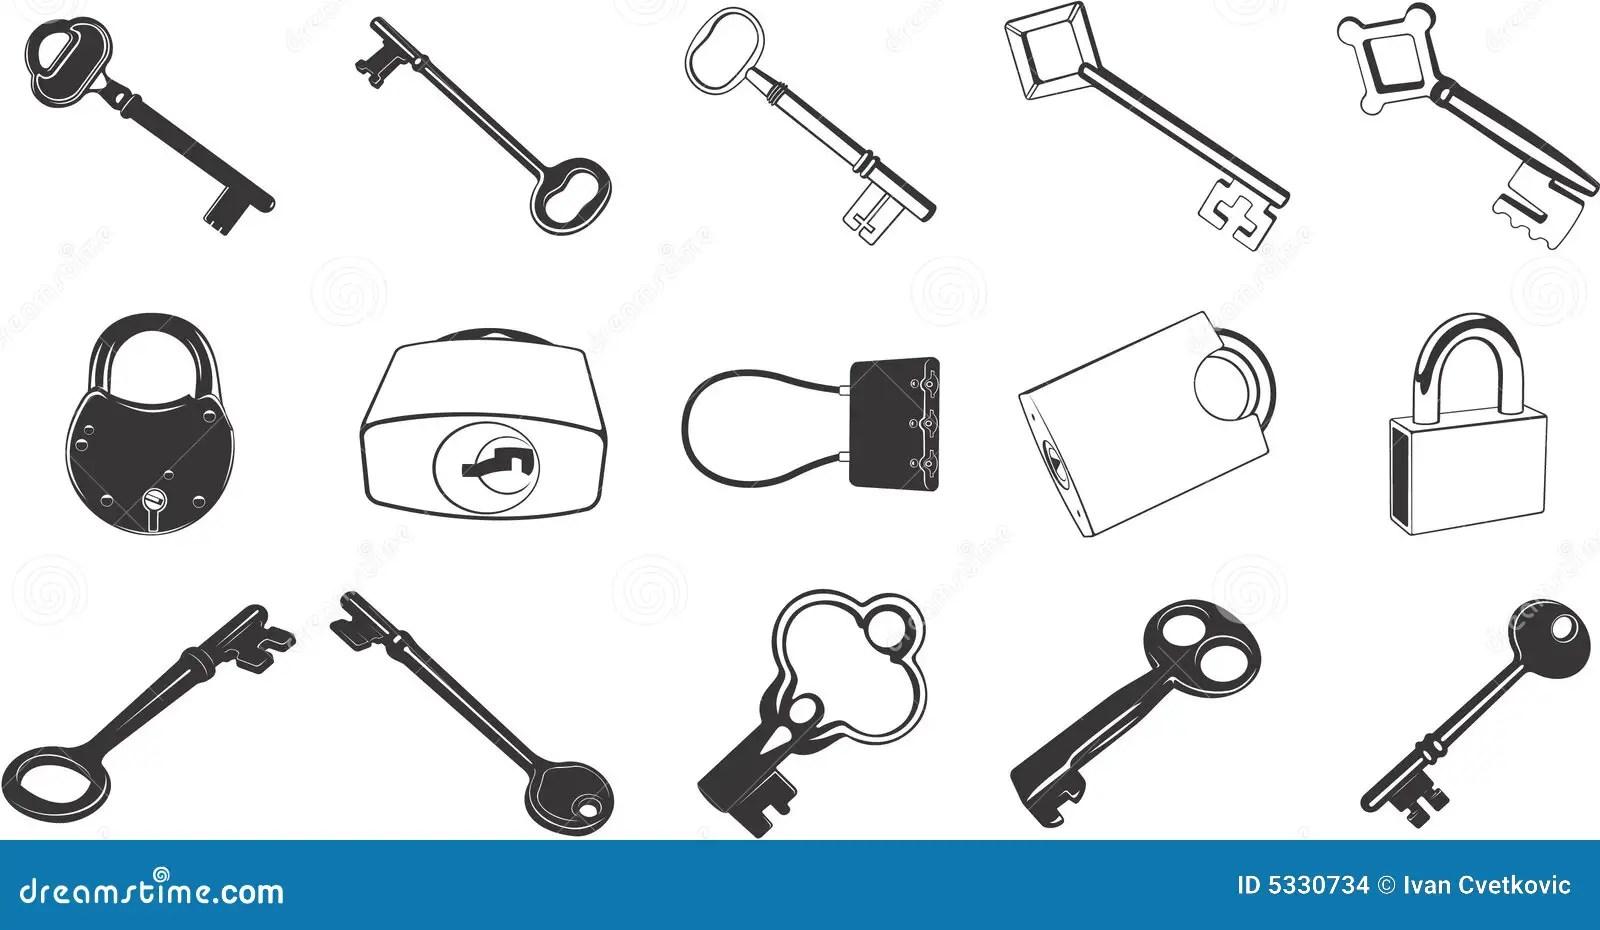 a more key